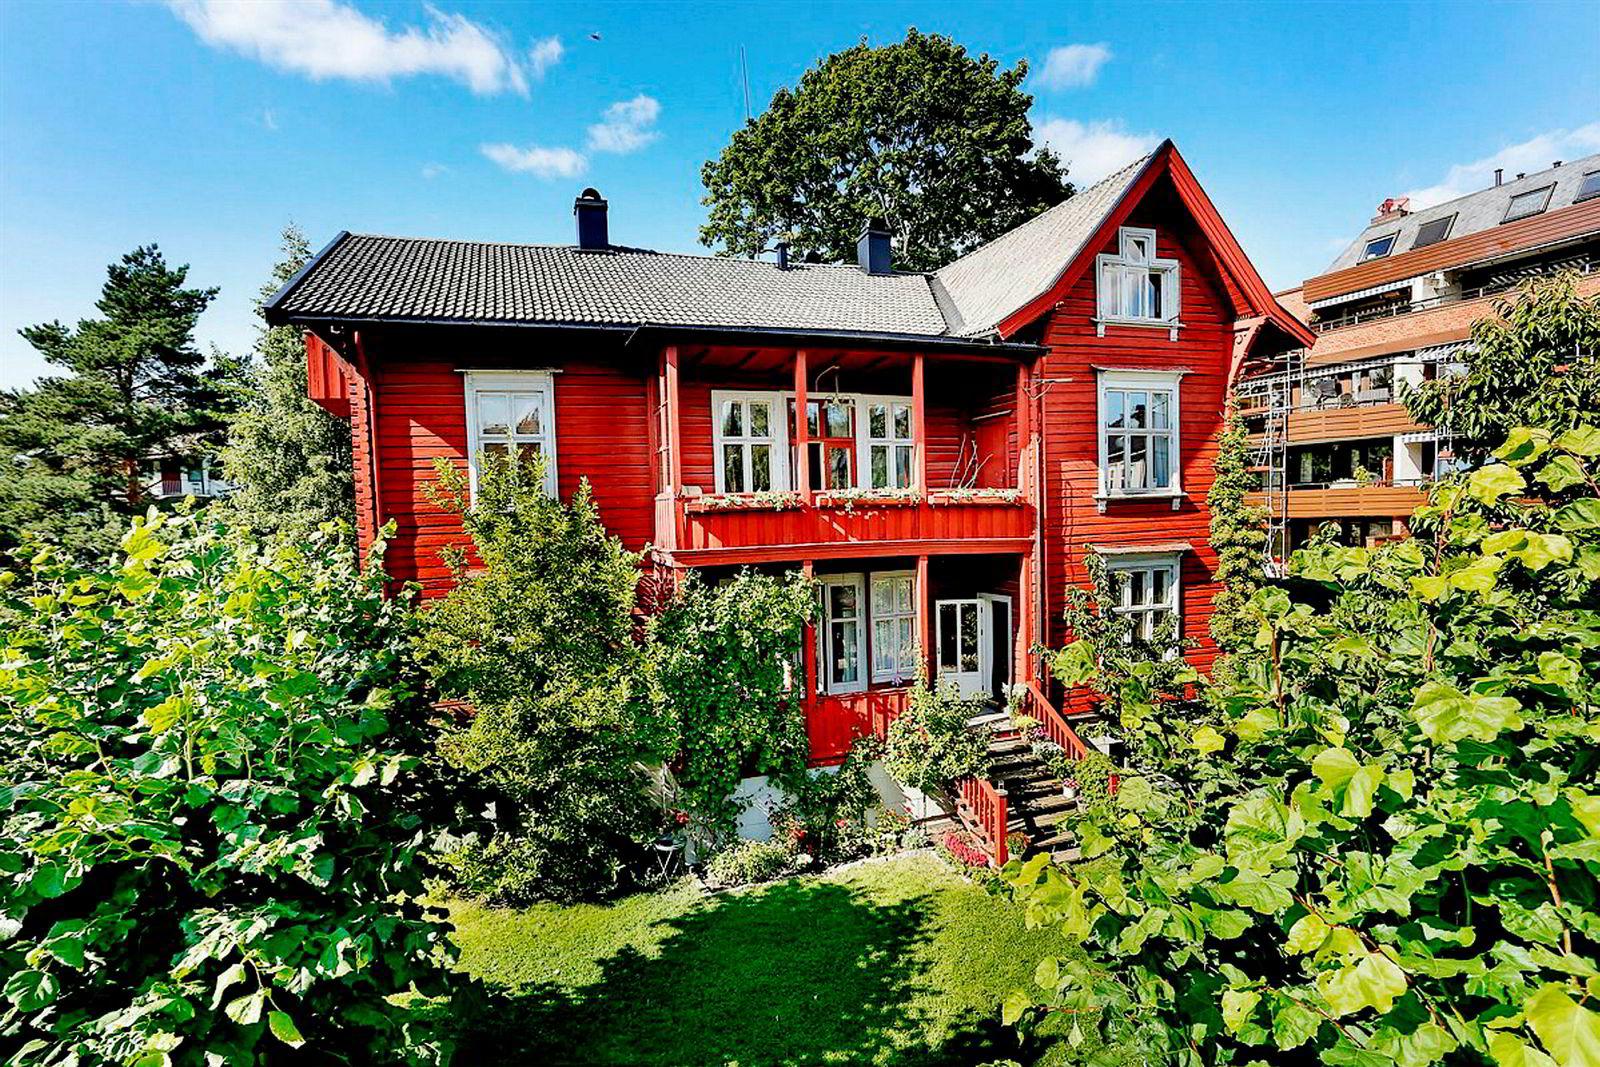 Denne sveitservillaen er nå solgt. Prisantydningen ble nesten nådd, ifølge megler. Foto: Foto: Nordvik & partners